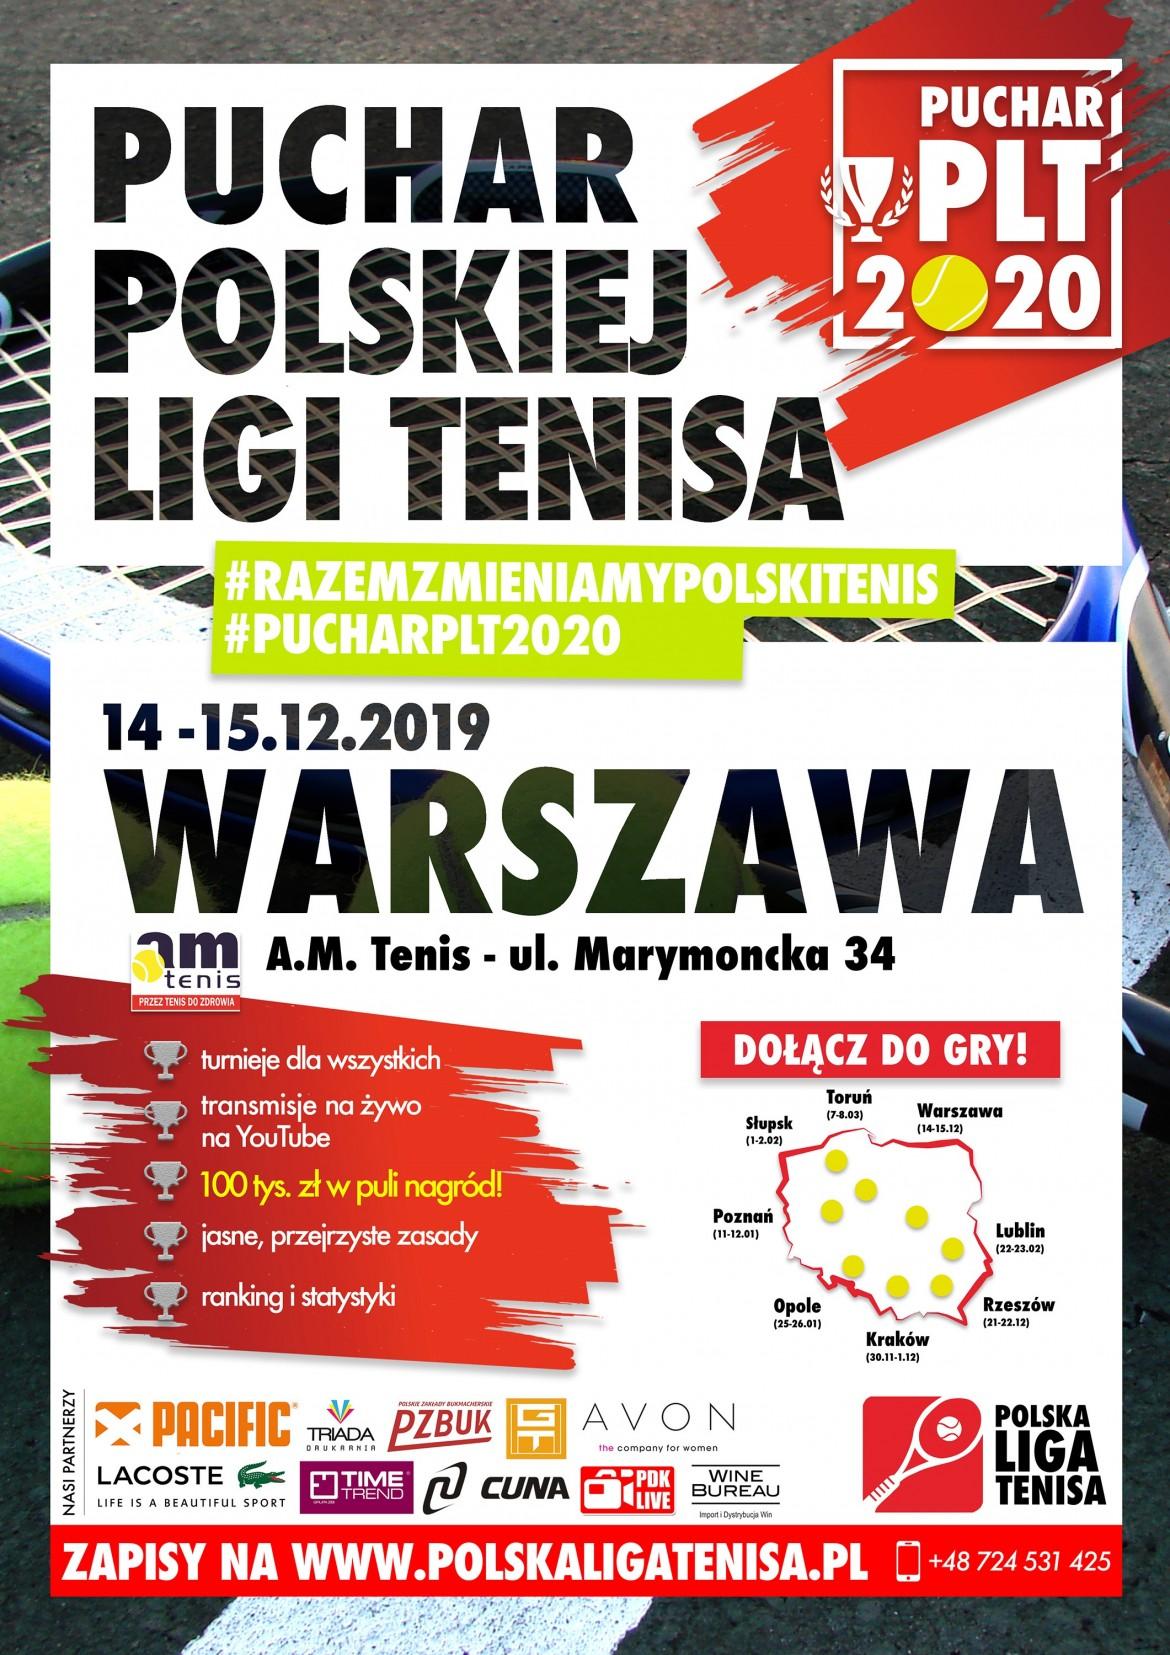 Puchar Polskiej Ligi Tenisa